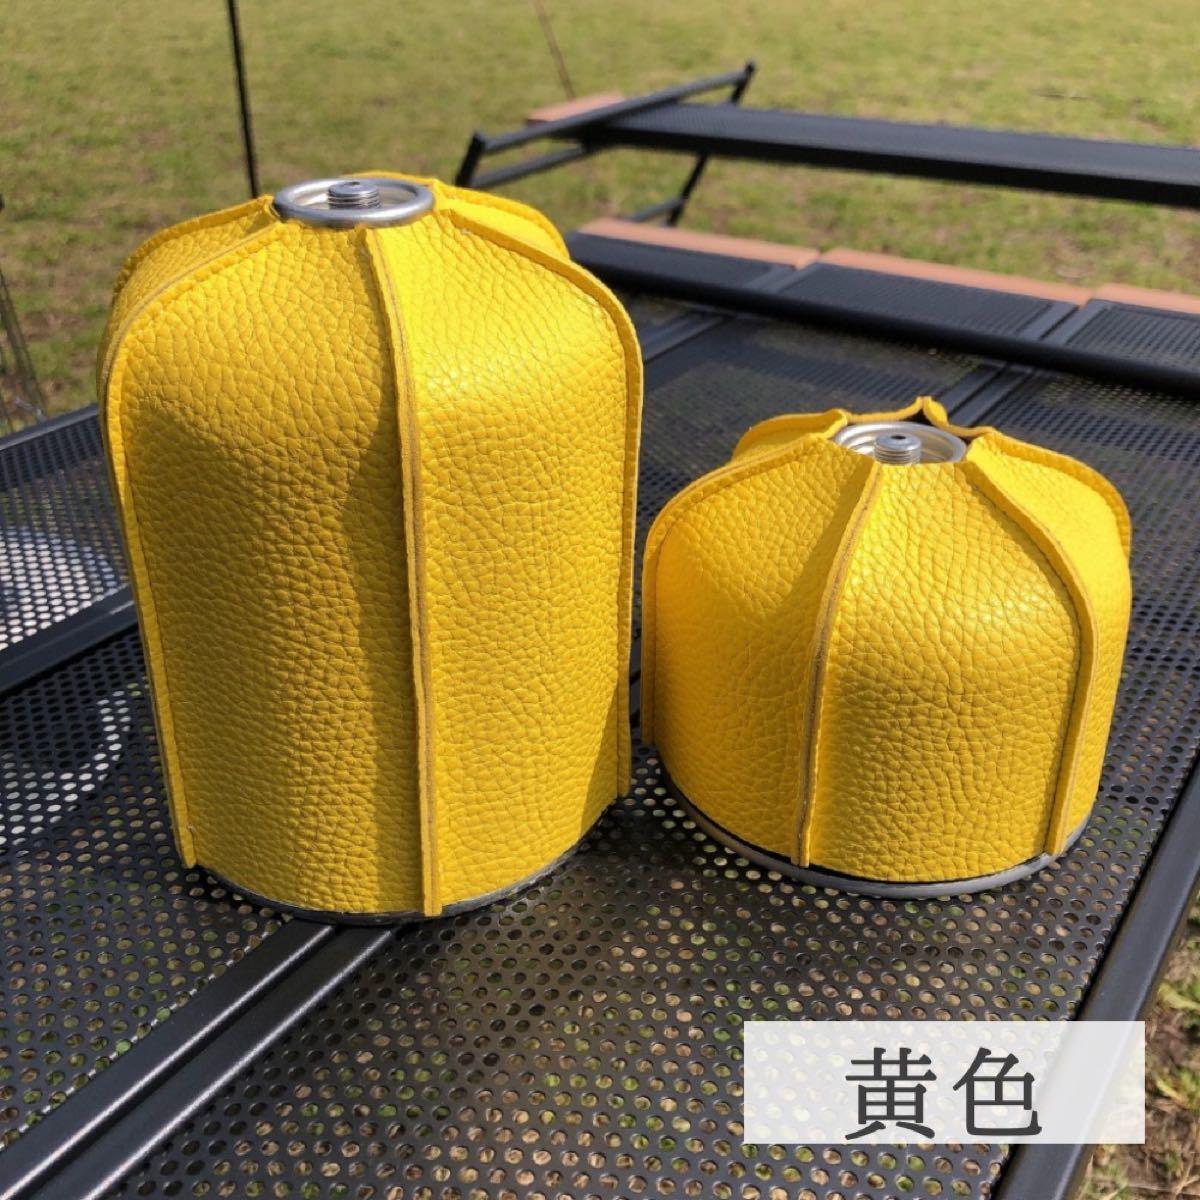 OD缶カバー ショート缶用 230/250g 革 アウトドア ガス缶 ケース  ヴィンテージ キャンプ ランタン イエロー